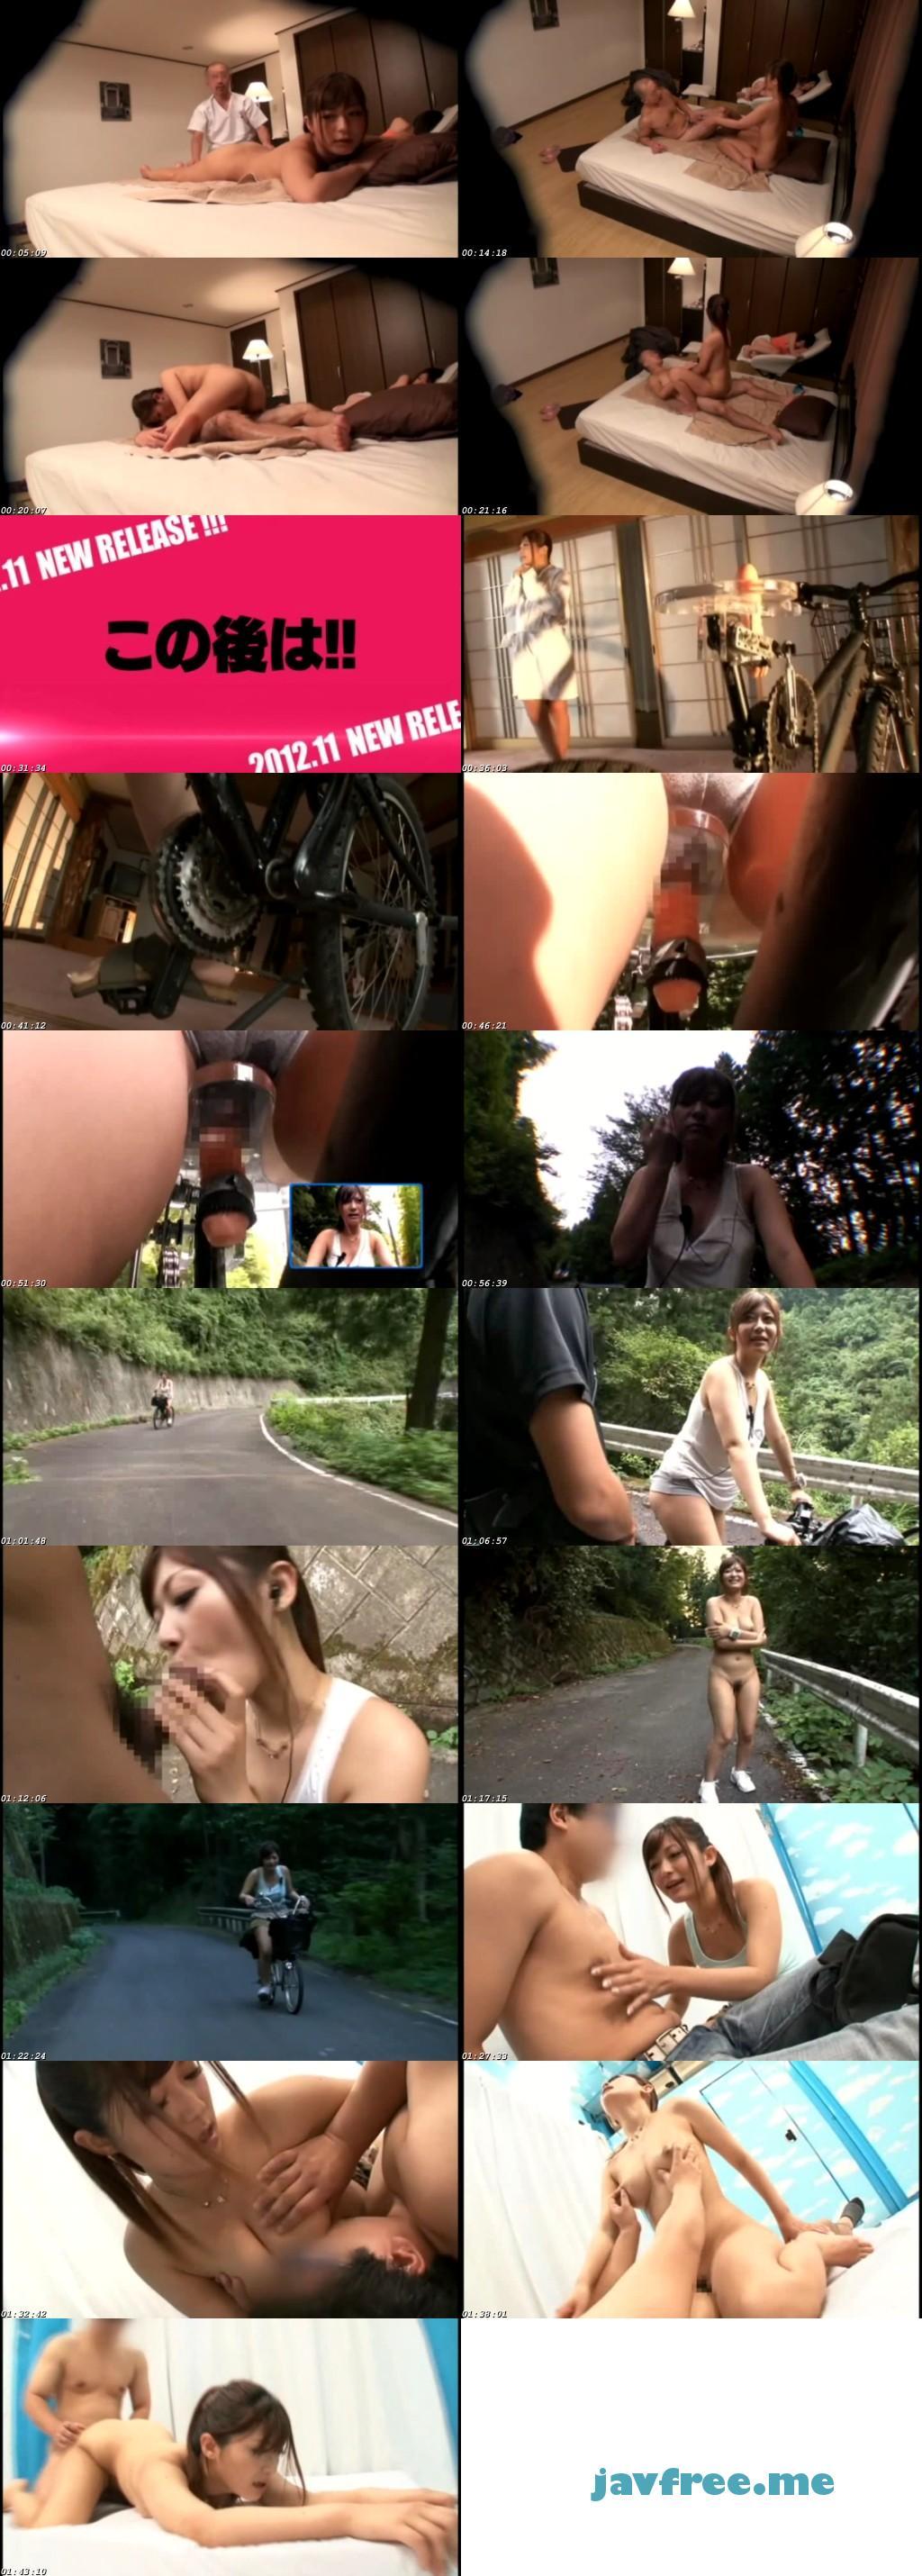 [SDMT 734] さとう遥希 15セックス×8時間 完全撮りおろし「アクメ自転車がイクッ!!無敵の潮吹き20リットル大観測&田舎町で逆ナンパしてMM号SEX」映像入り さとう遥希 SDMT